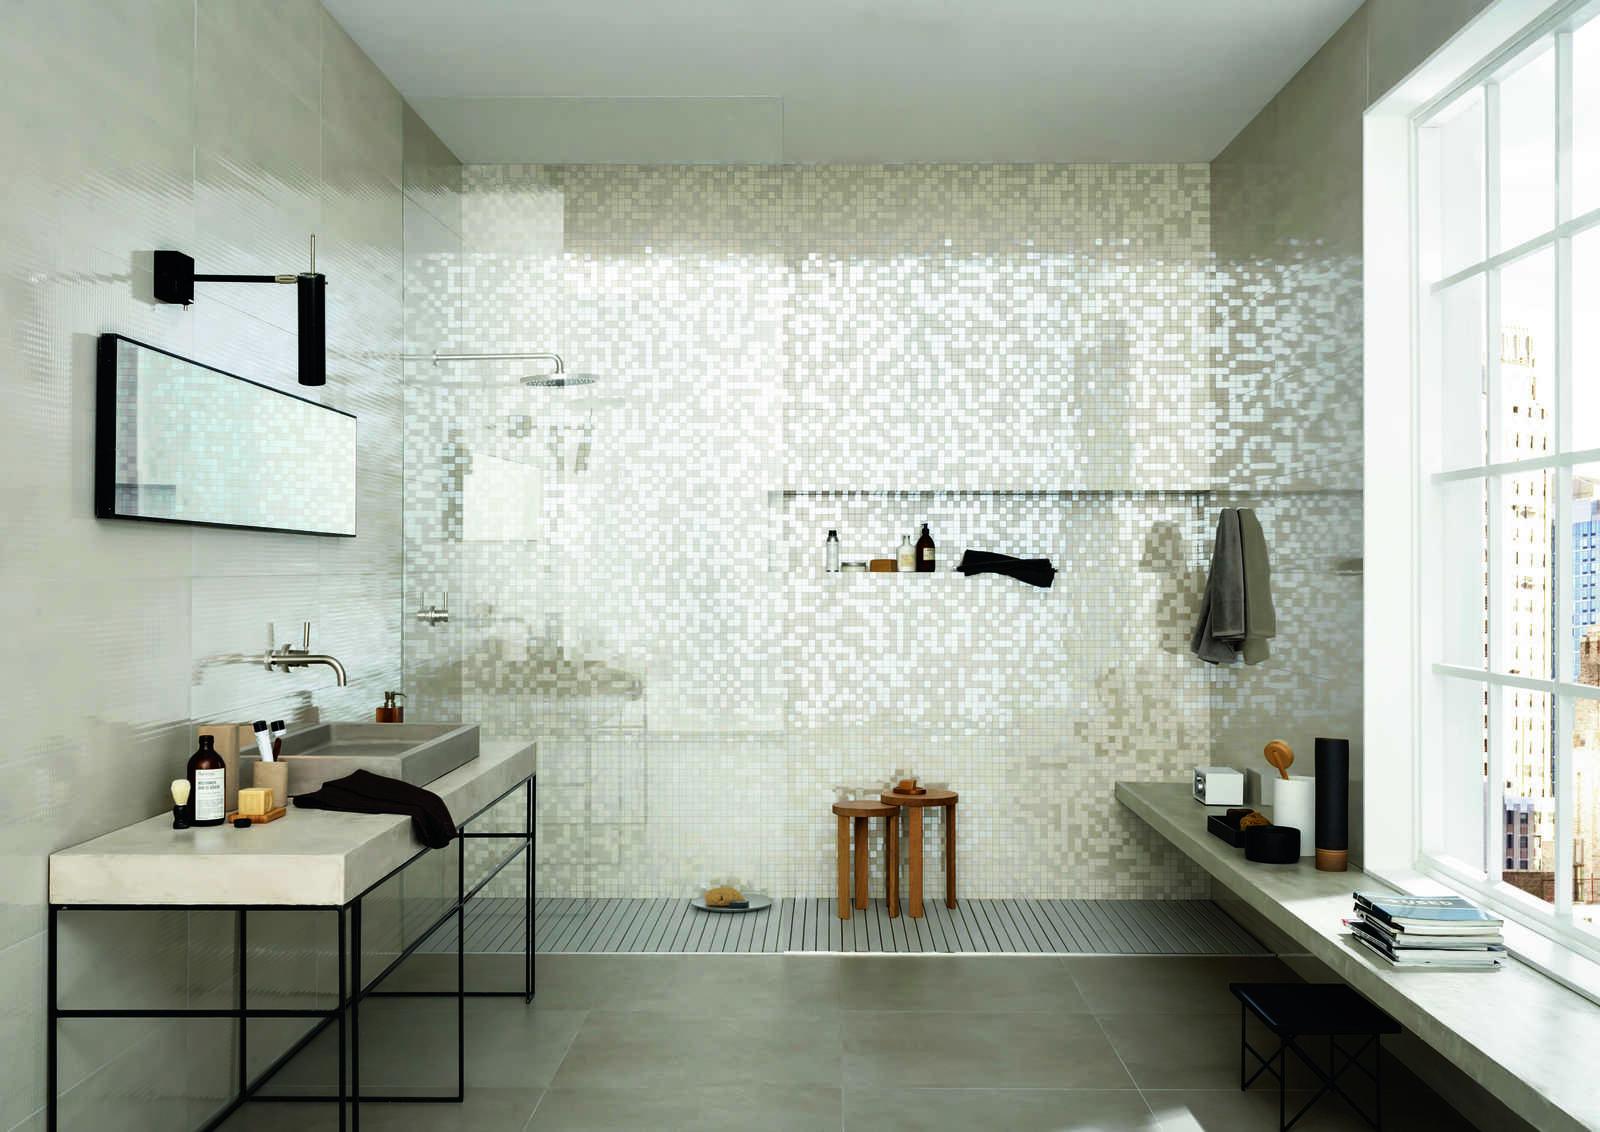 Imperfetto coloured porcelain bathroom tiles marazzi imperfetto ceramic tiles marazzi6326 doublecrazyfo Choice Image